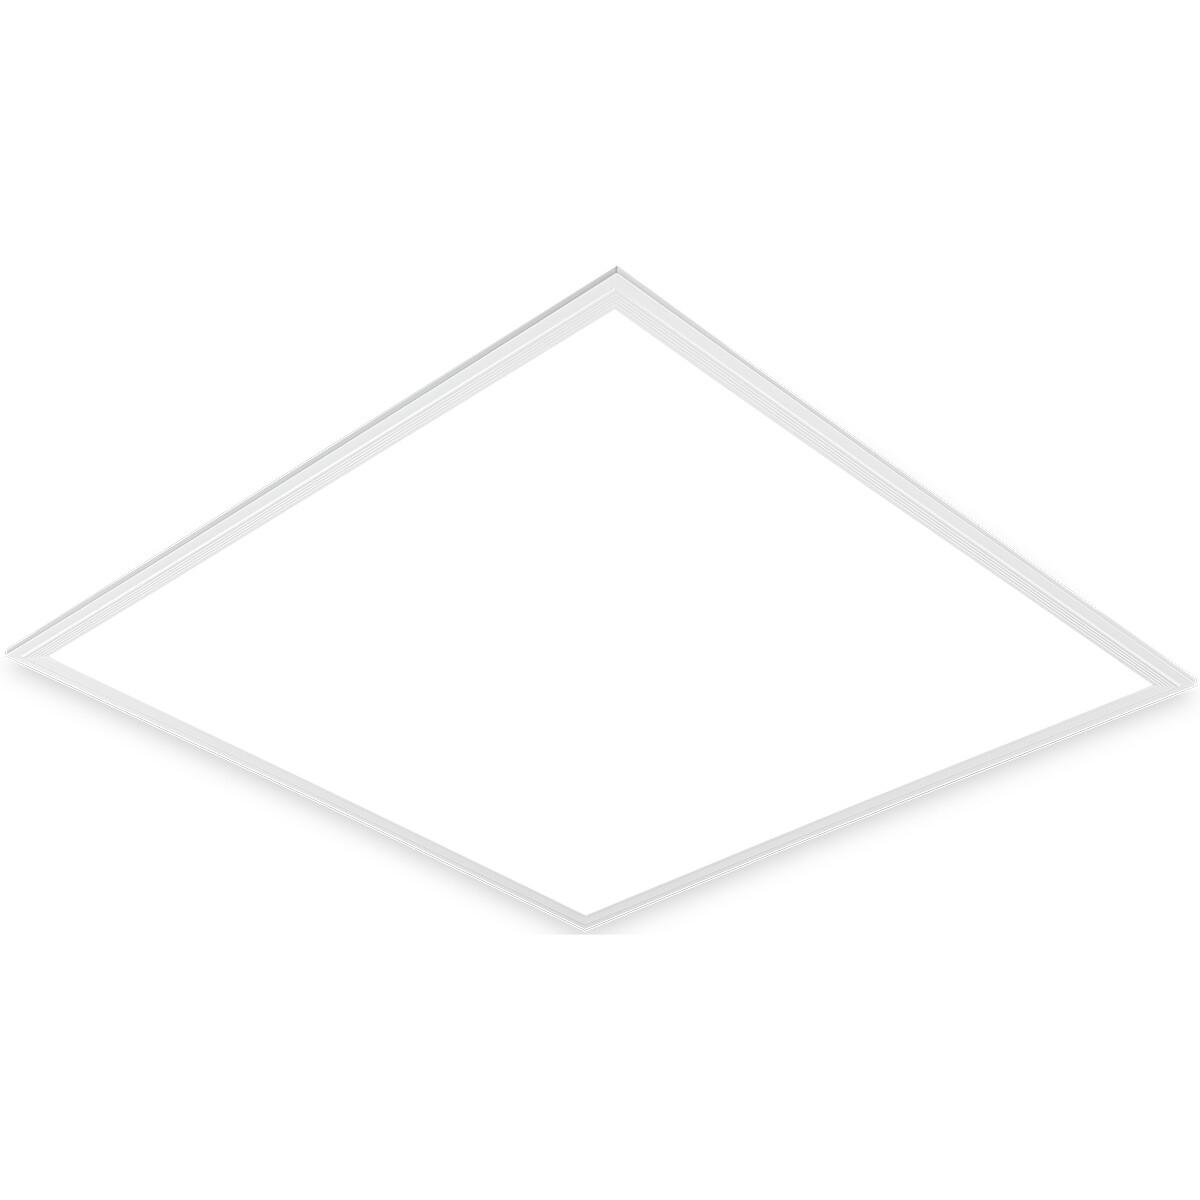 LED Paneel - Aigi Clena - 60x60 Helder/Koud Wit 6000K - 40W Inbouw Vierkant - Mat Wit - Flikkervrij